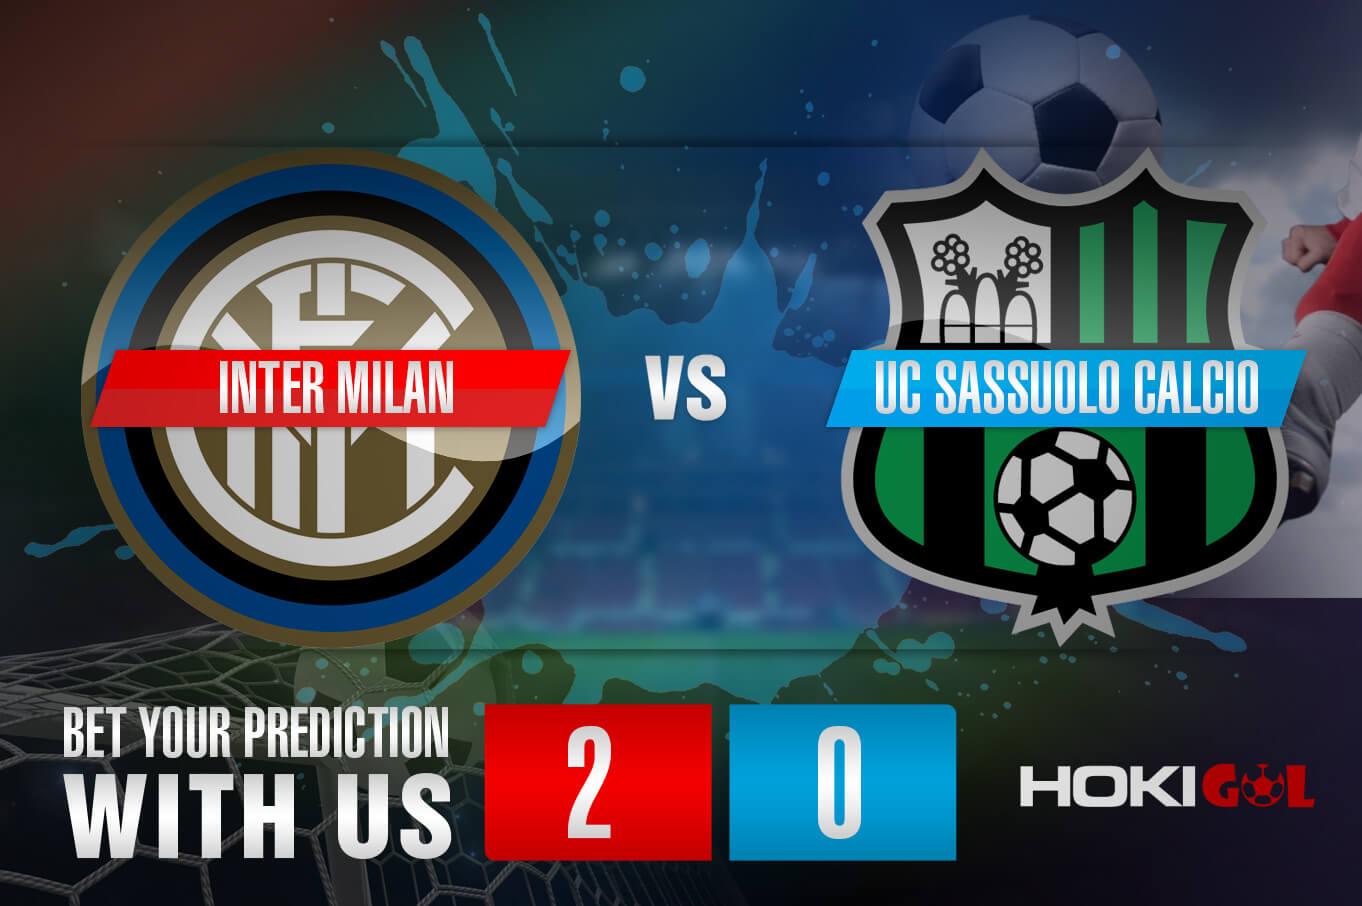 Prediksi Bola Inter Milan Vs UC Sassuolo Calcio 7 April 2021